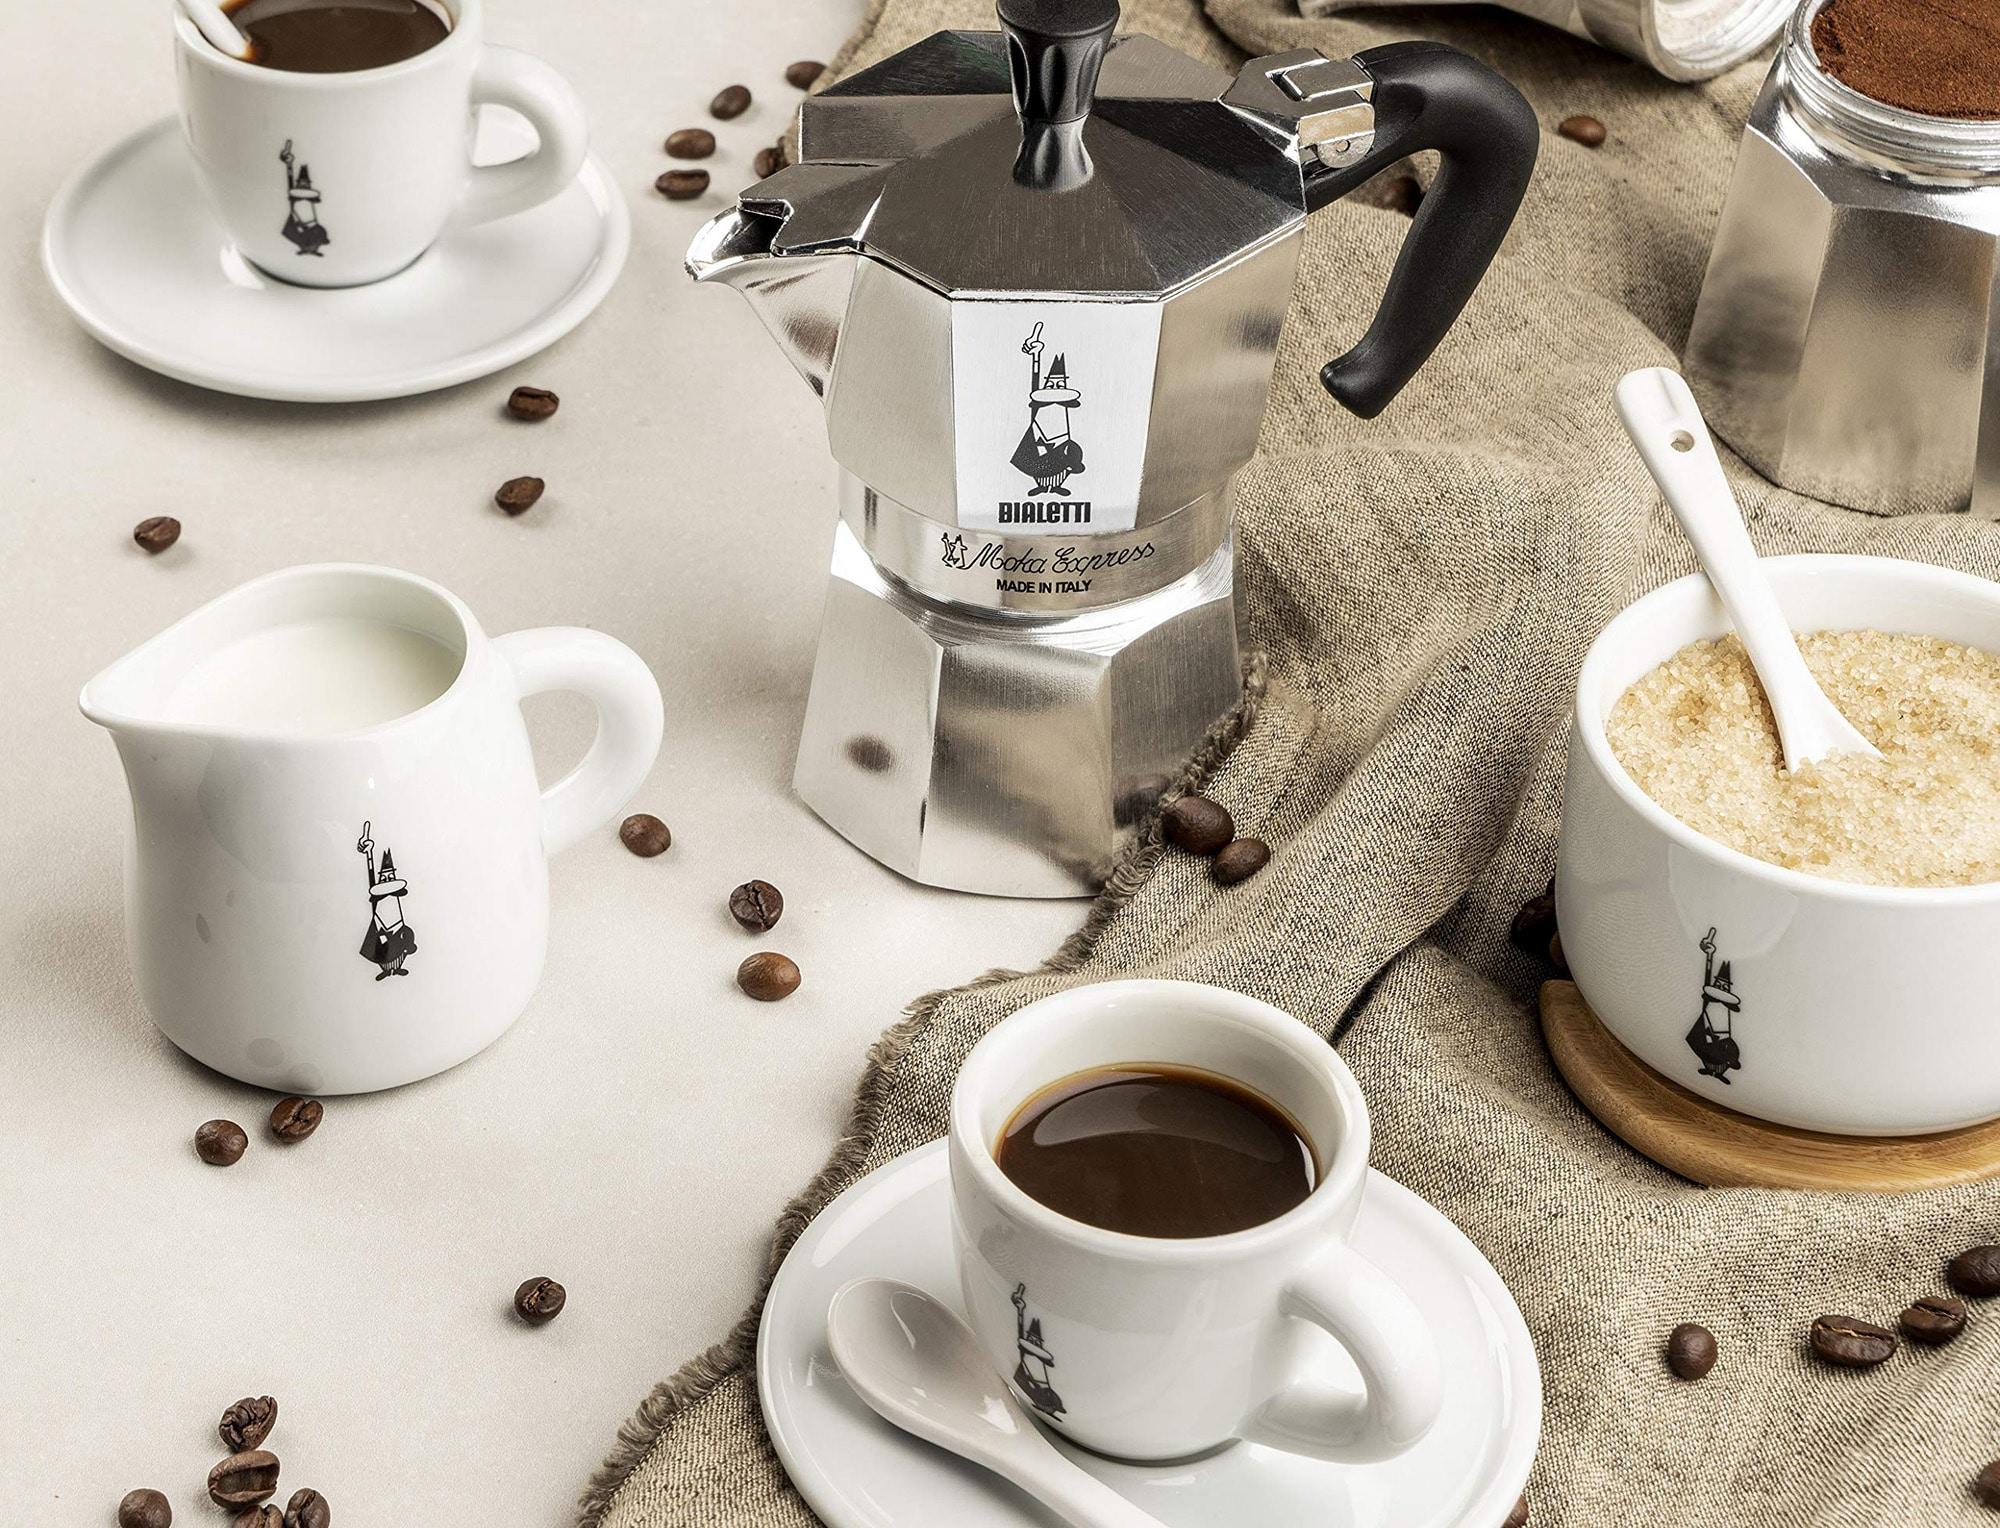 Best Manual Coffee Makers Reviewed in Detail